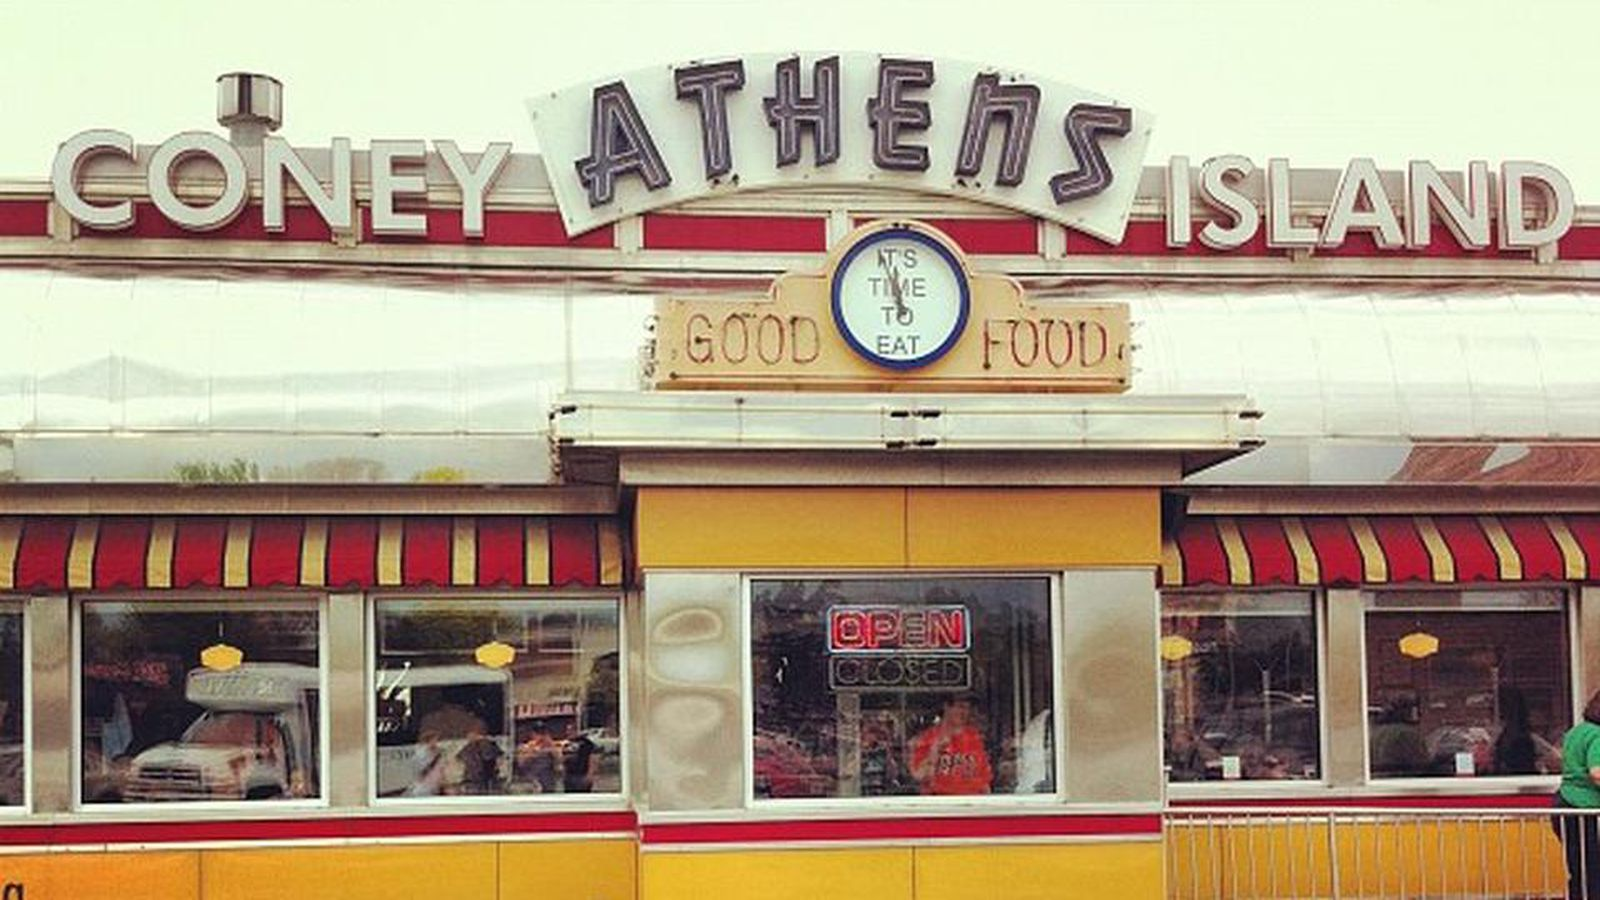 Original Coney Island Diner